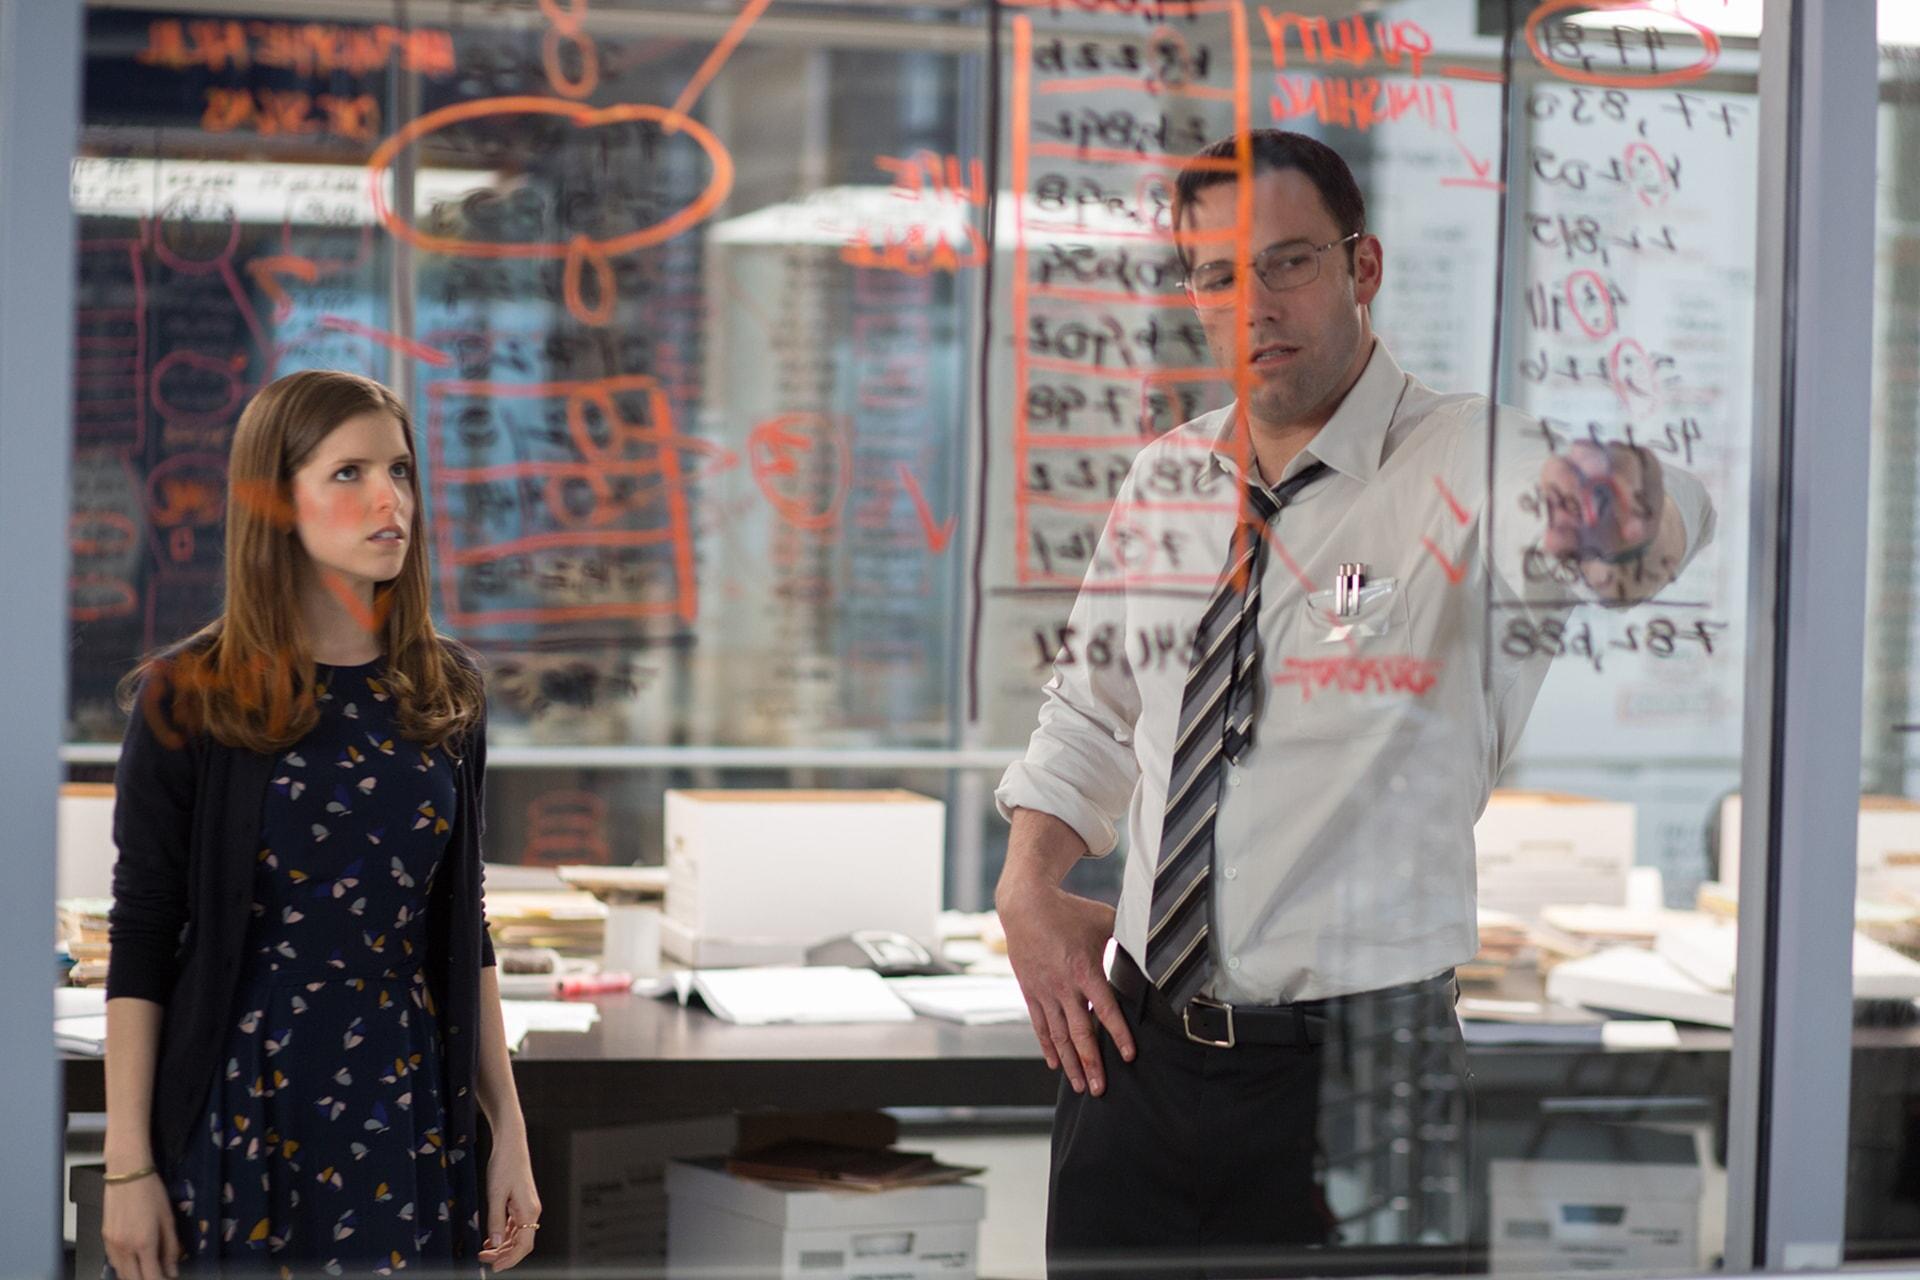 ANNA KENDRICK as Dana and BEN AFFLECK as Christian working out a math problem